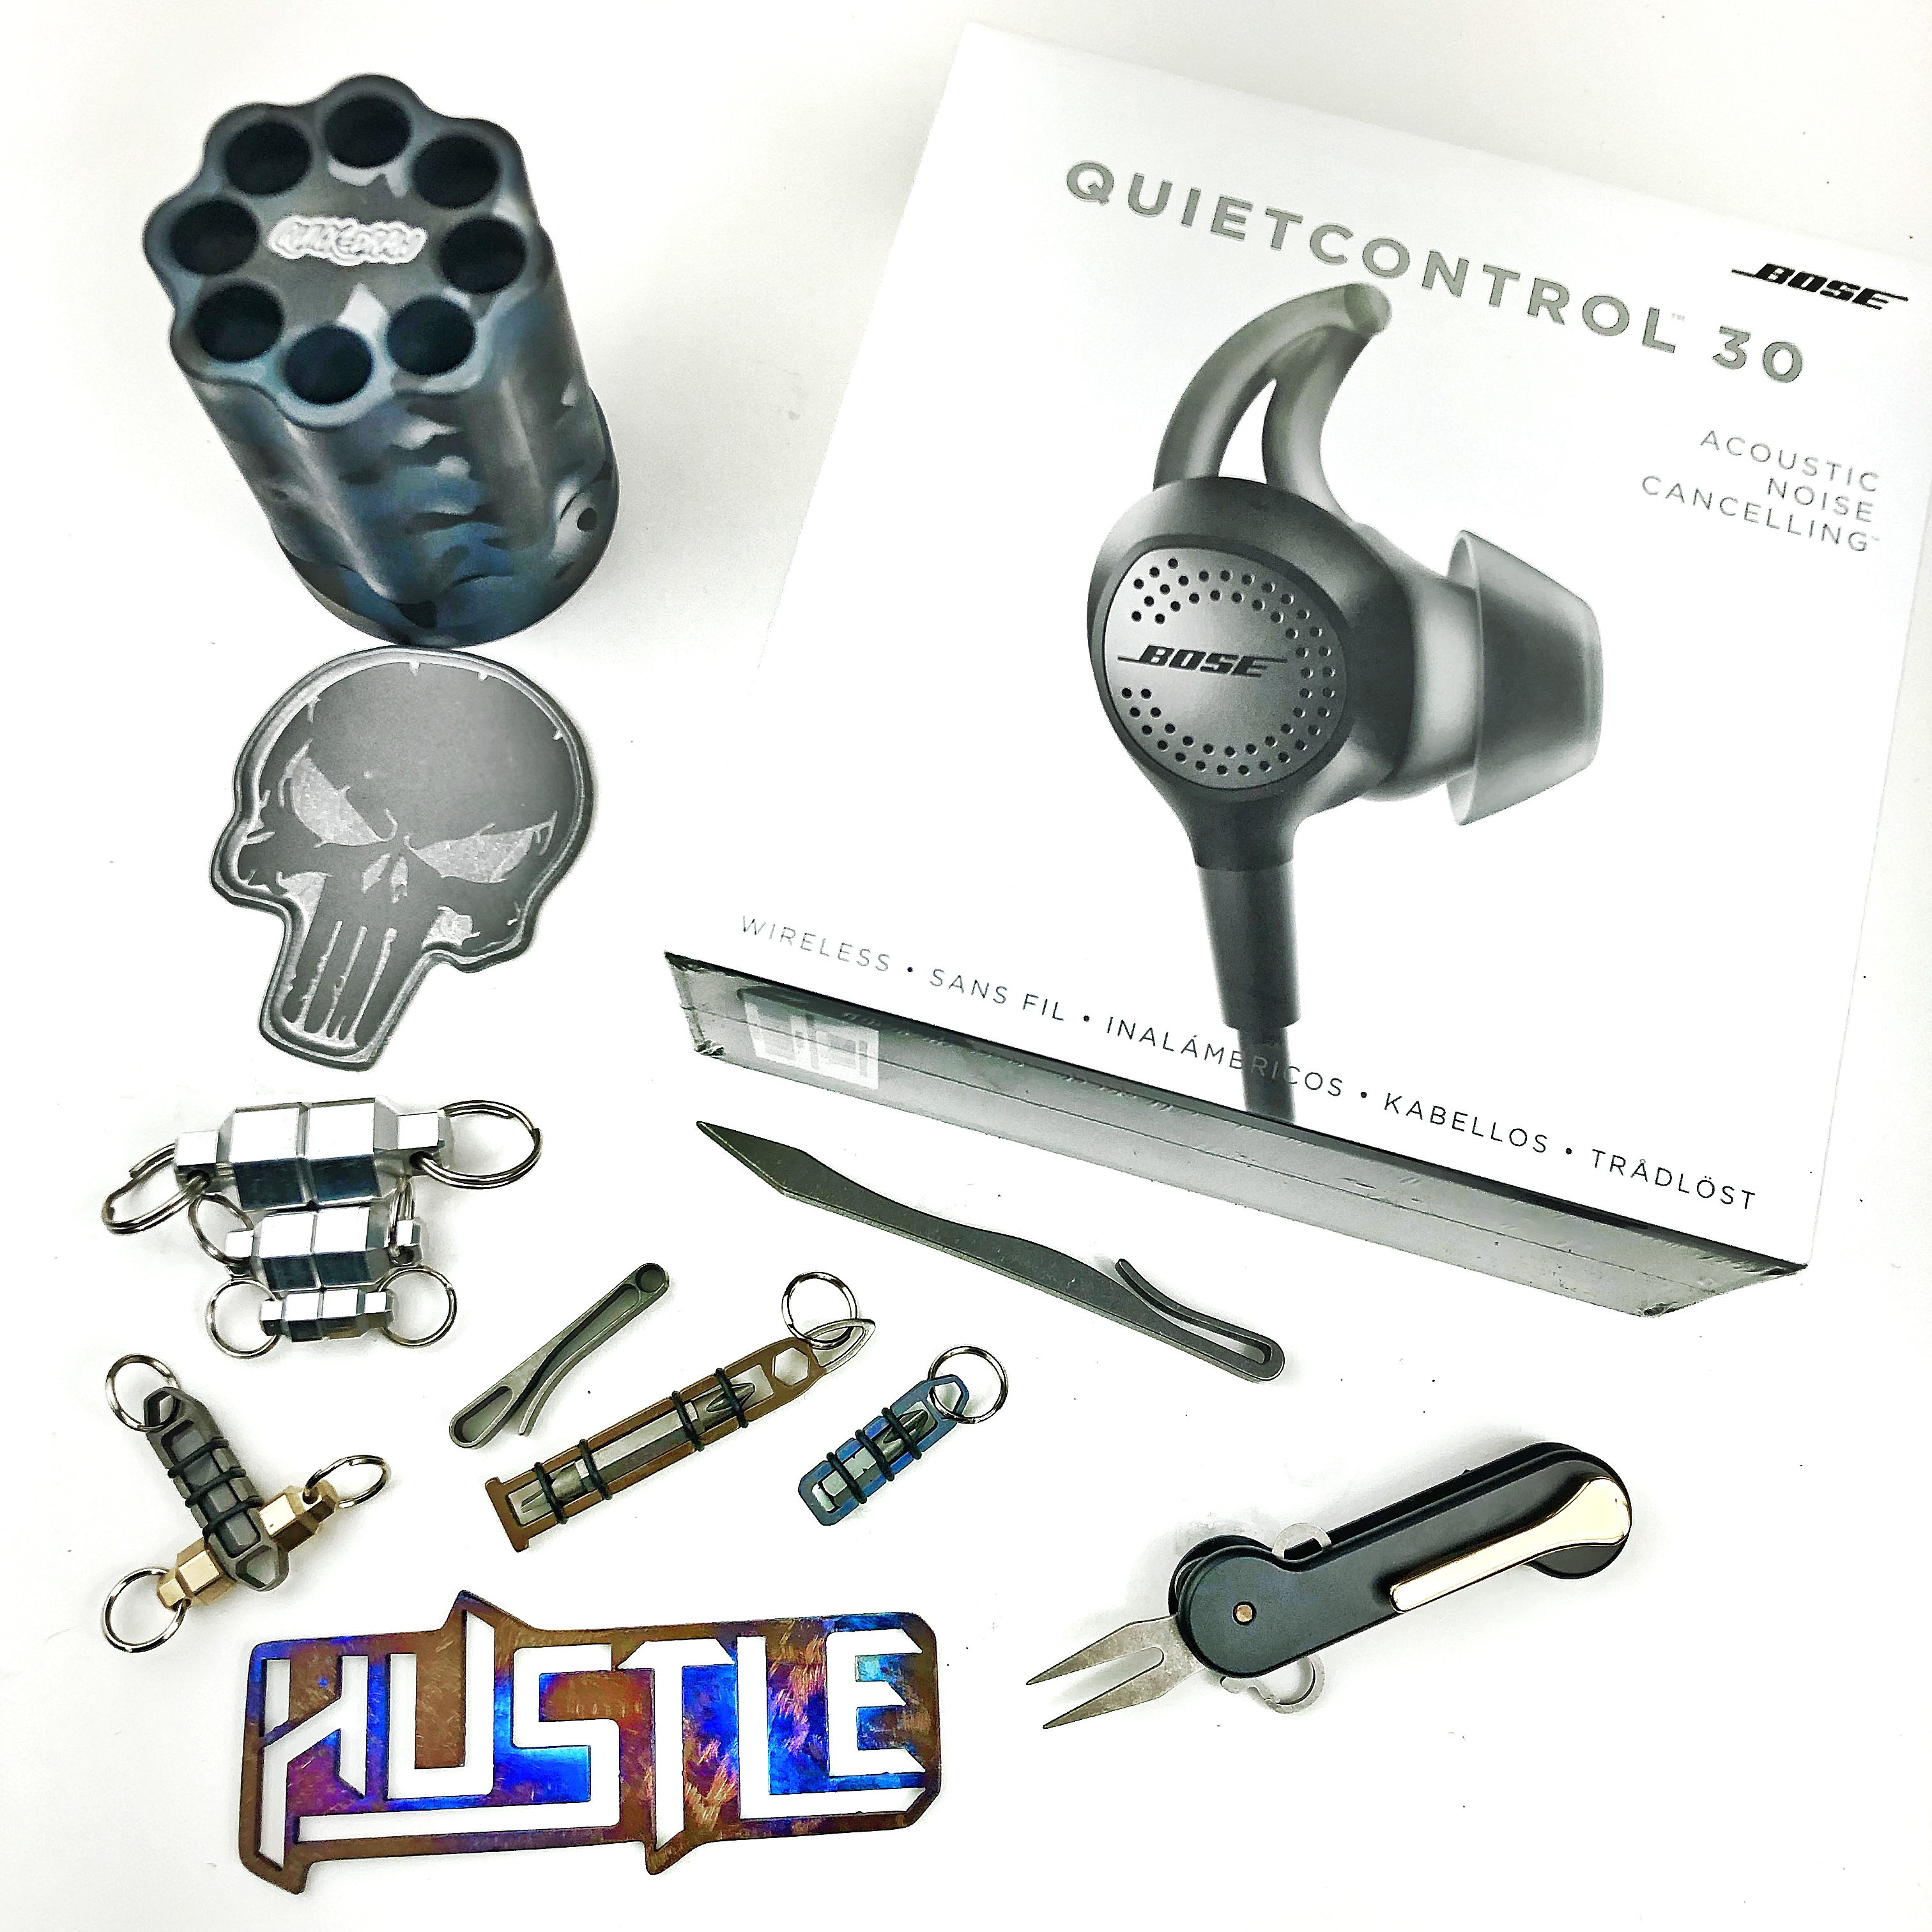 Bose Headphones Giveaway Giveaway Image